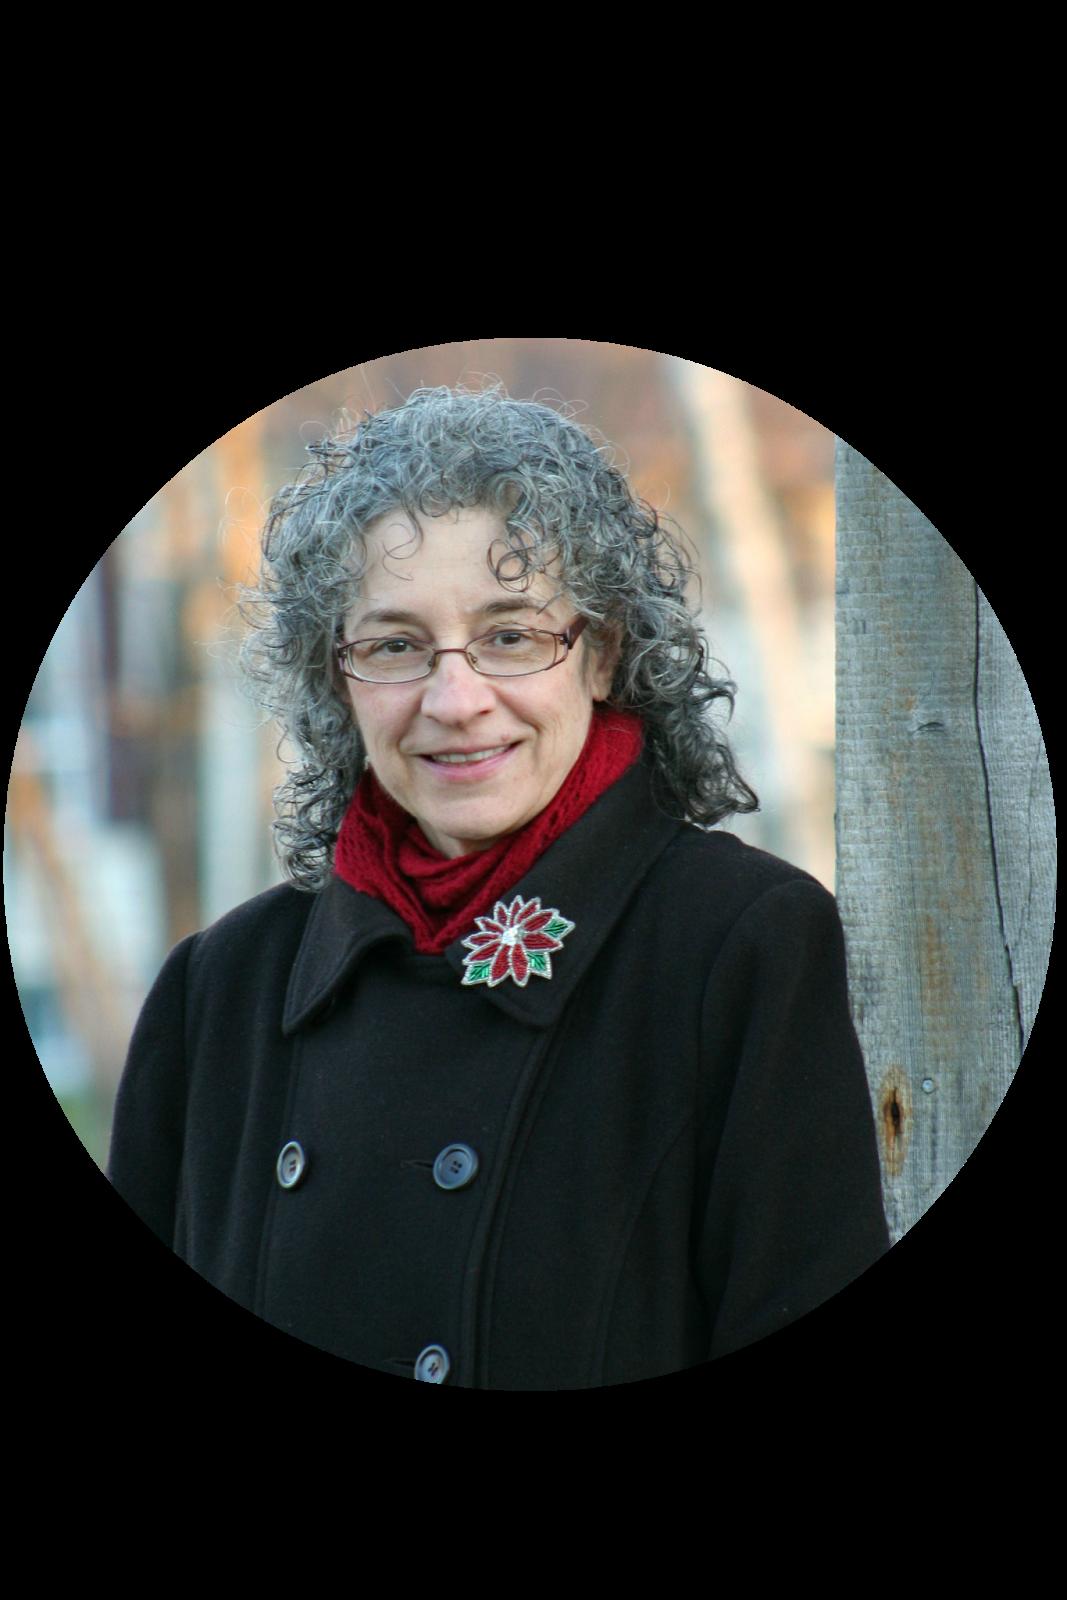 Sue Frelick, sewing teacher